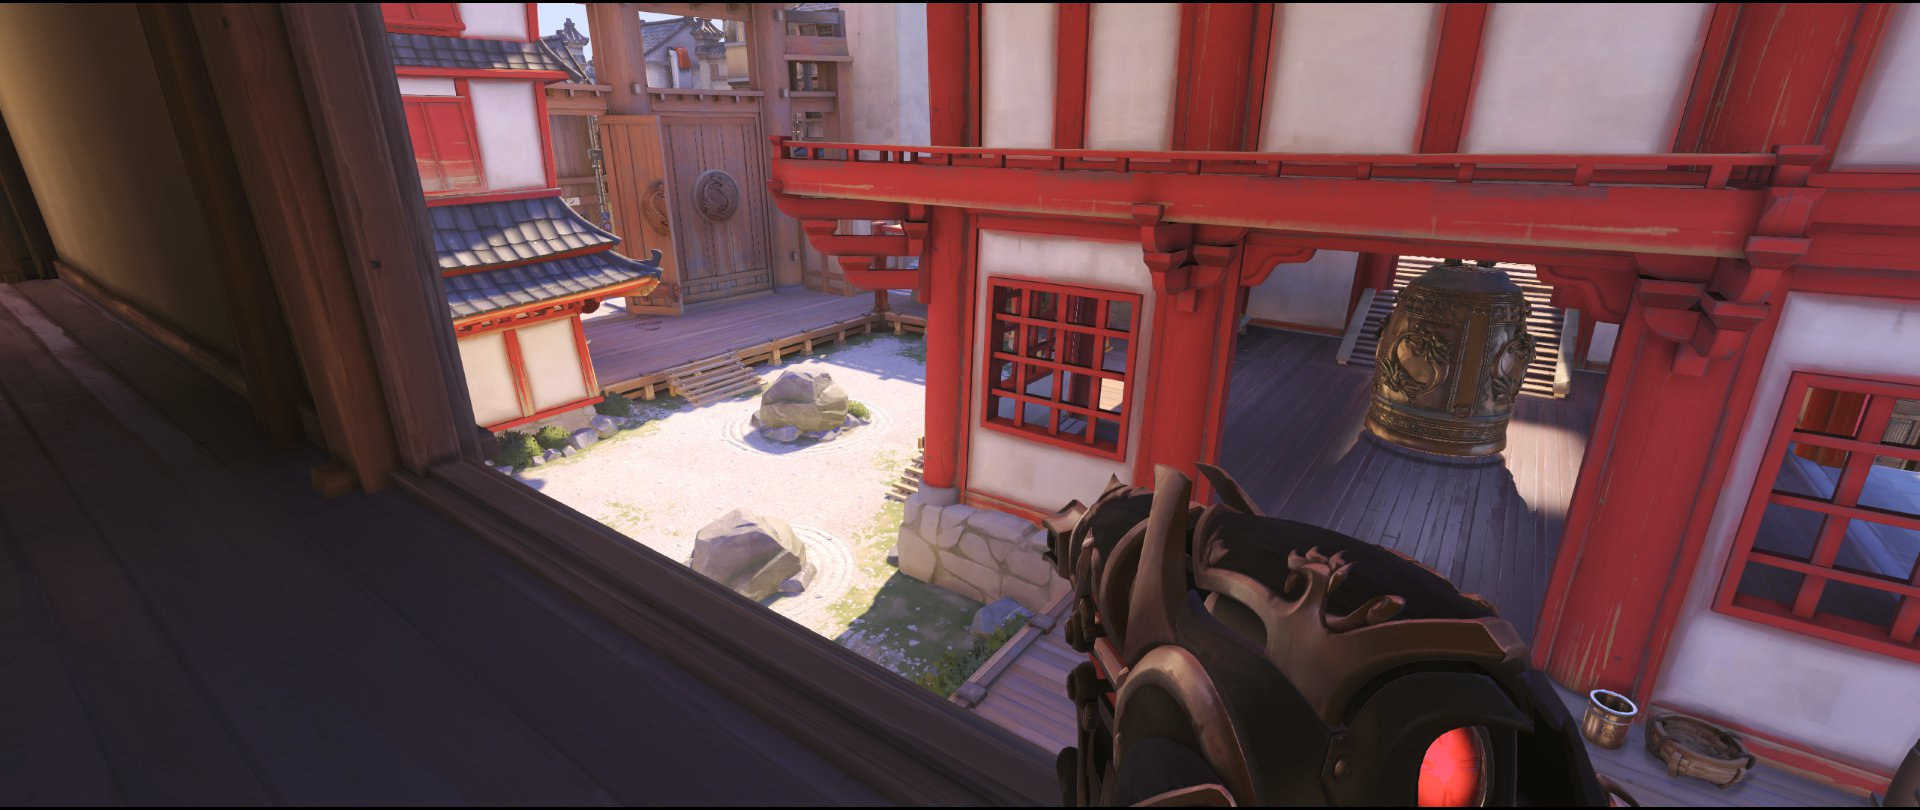 Apartment view defense Widowmaker sniping spot Hanamura Overwatch.jpg